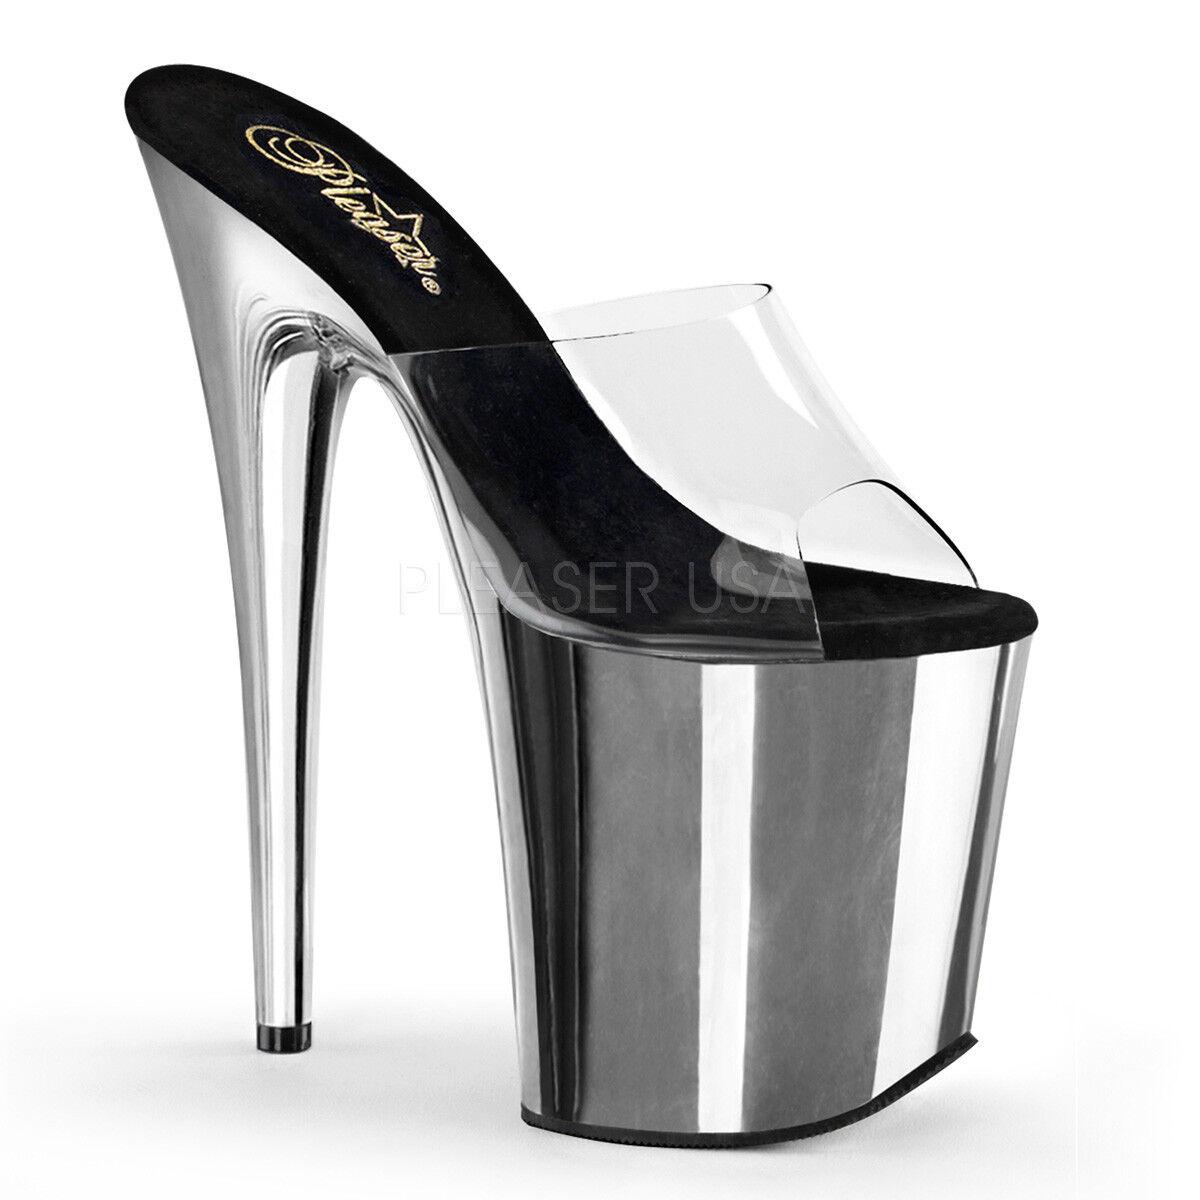 Pleaser Flamingo - 801 Mujer Plata Plata Plata Cromo Heel Platform Slide clara Mula Sandalia